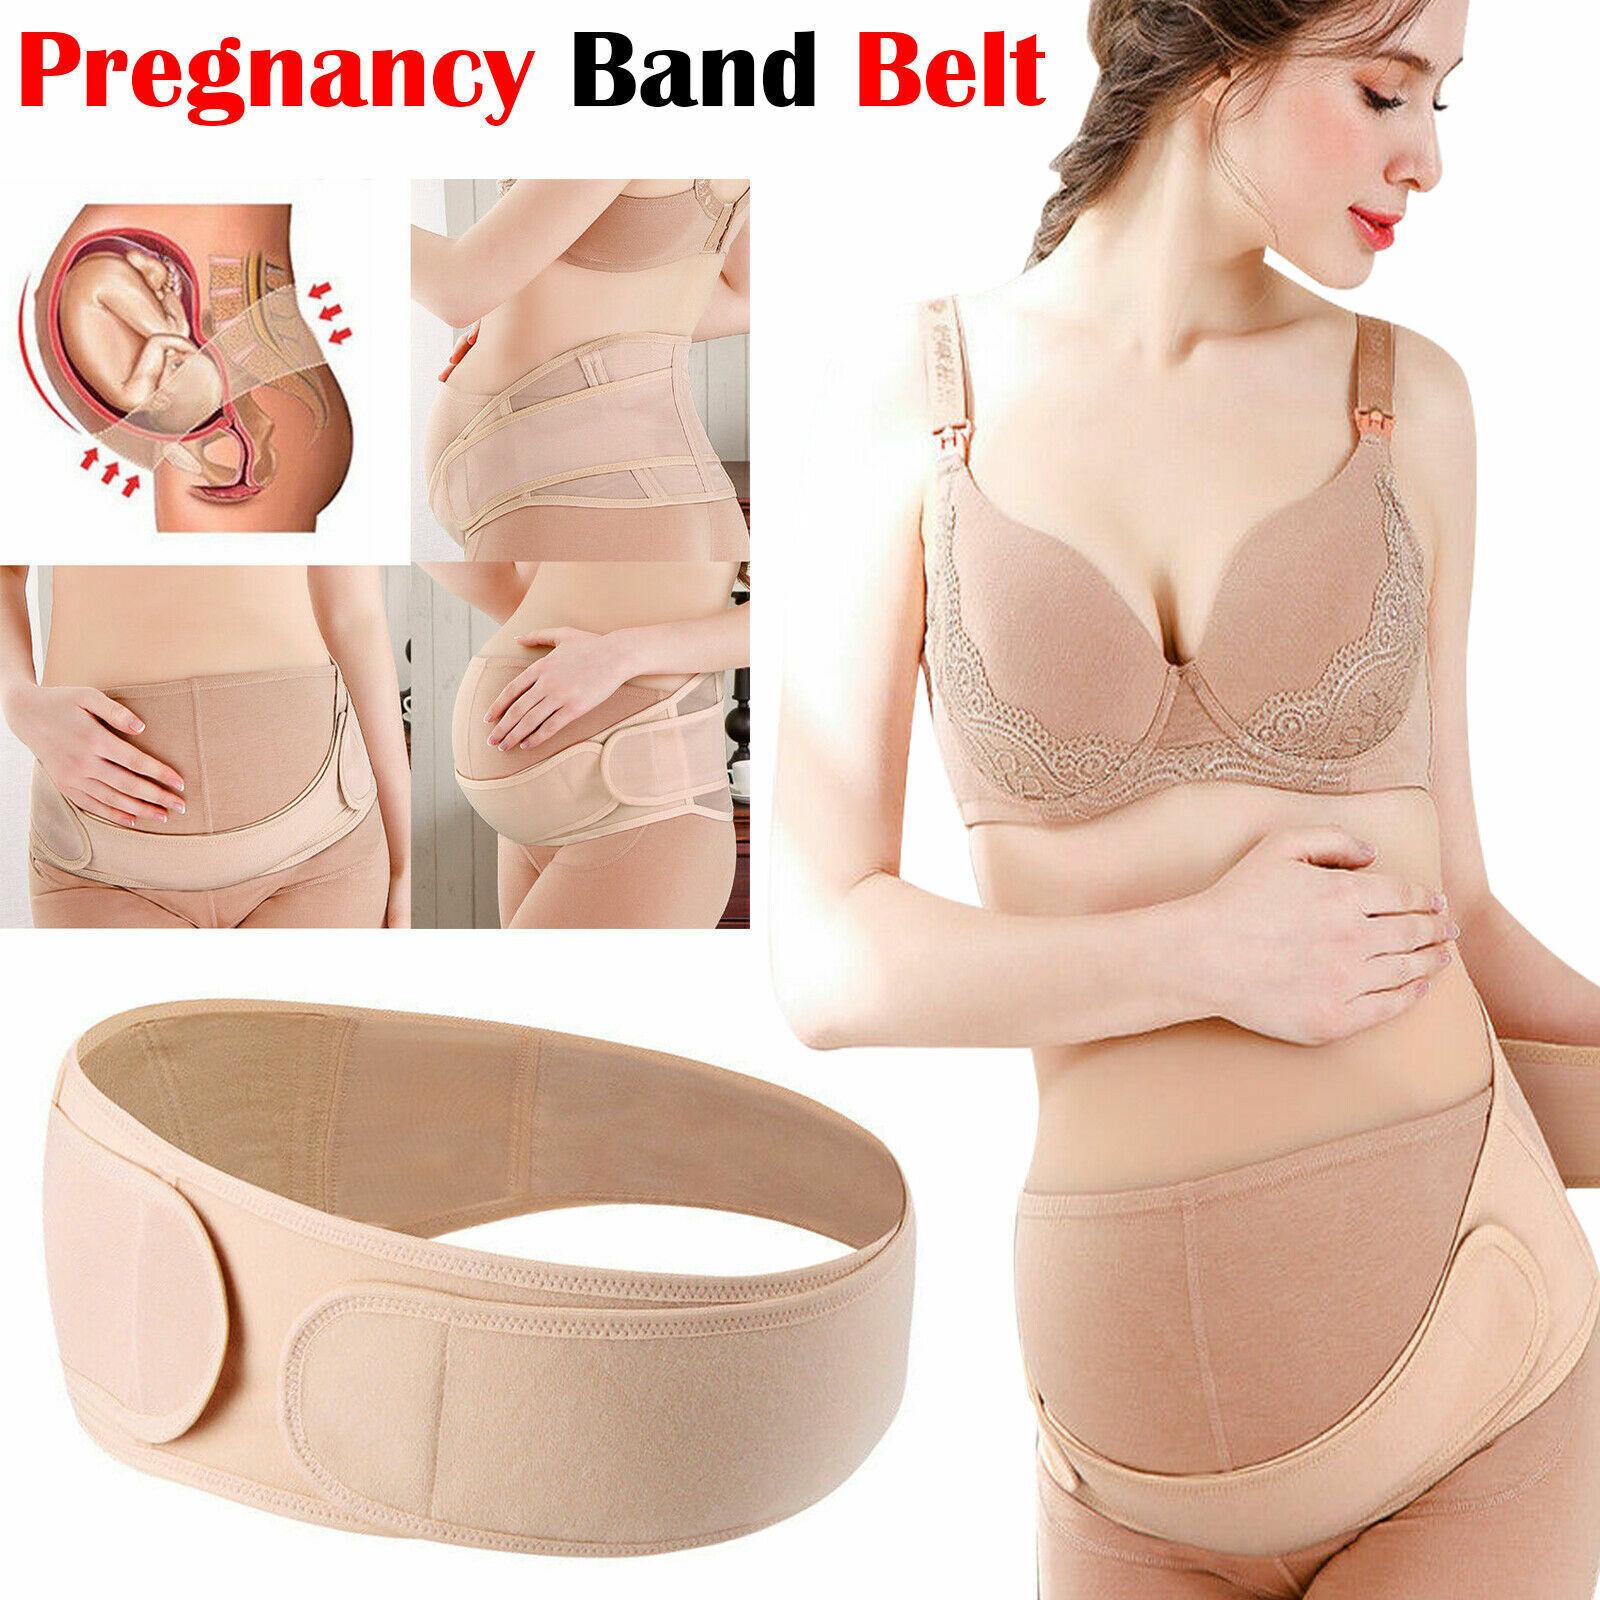 Maternity Pregnancy Band Belt Lumbar back Support Waist Belly bump Strap Lower